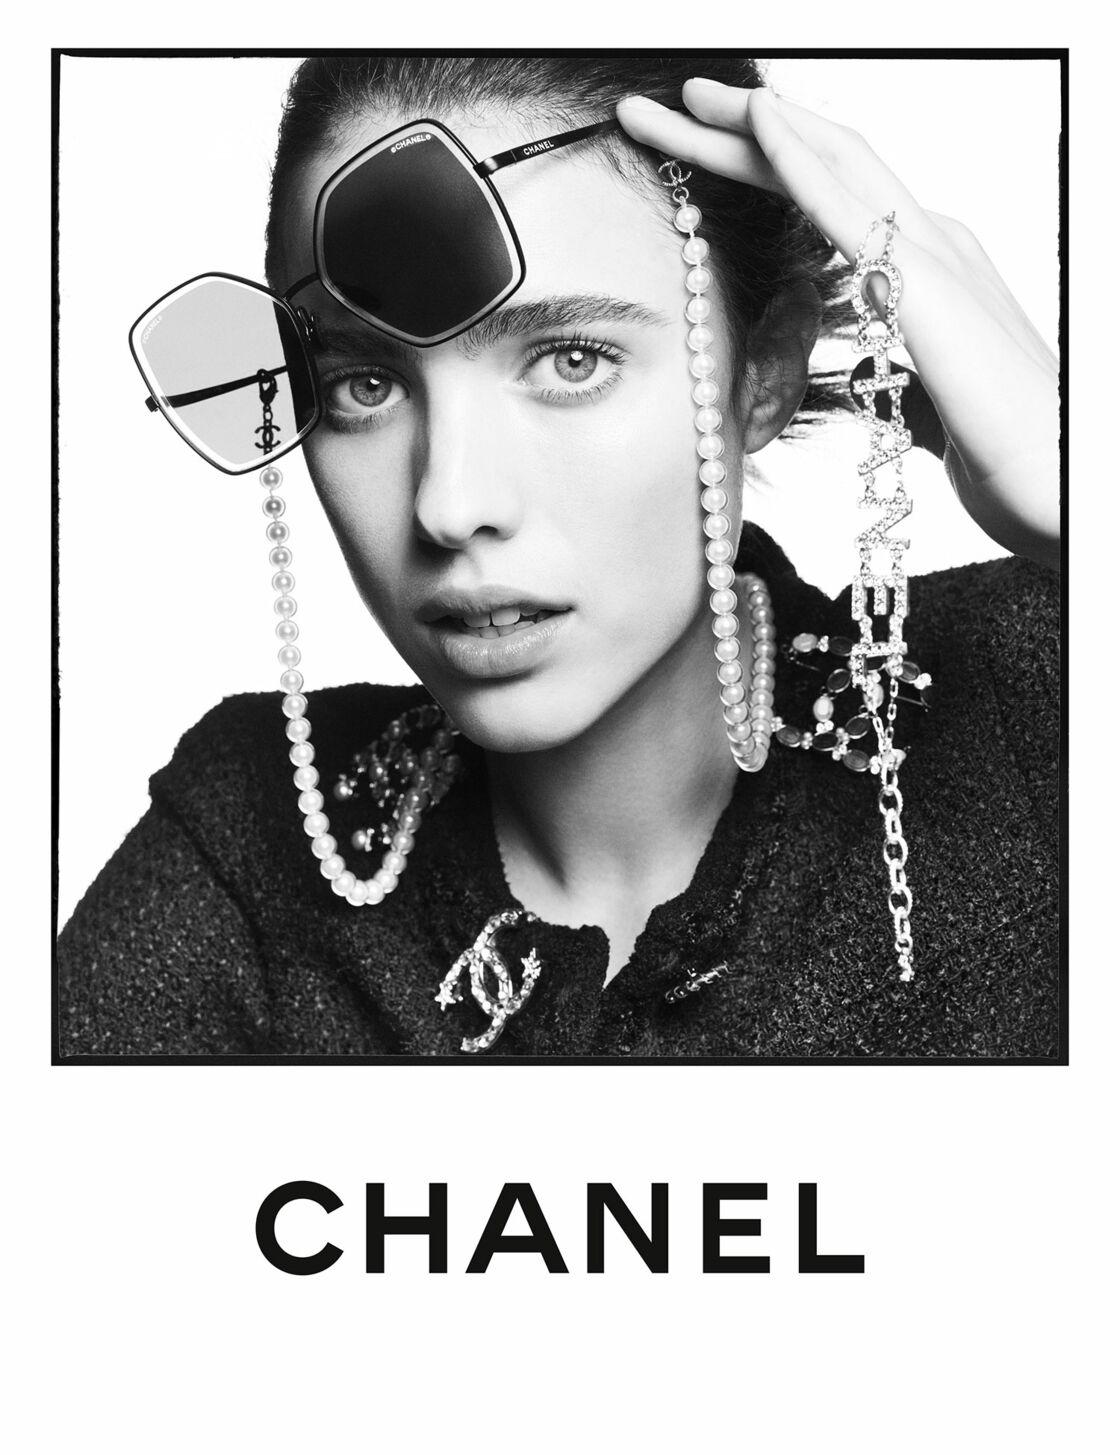 A 24 ans, Margaret Qualley, l'actrice et fille d'Andie Mc Dowell, signe sa première campagne Chanel